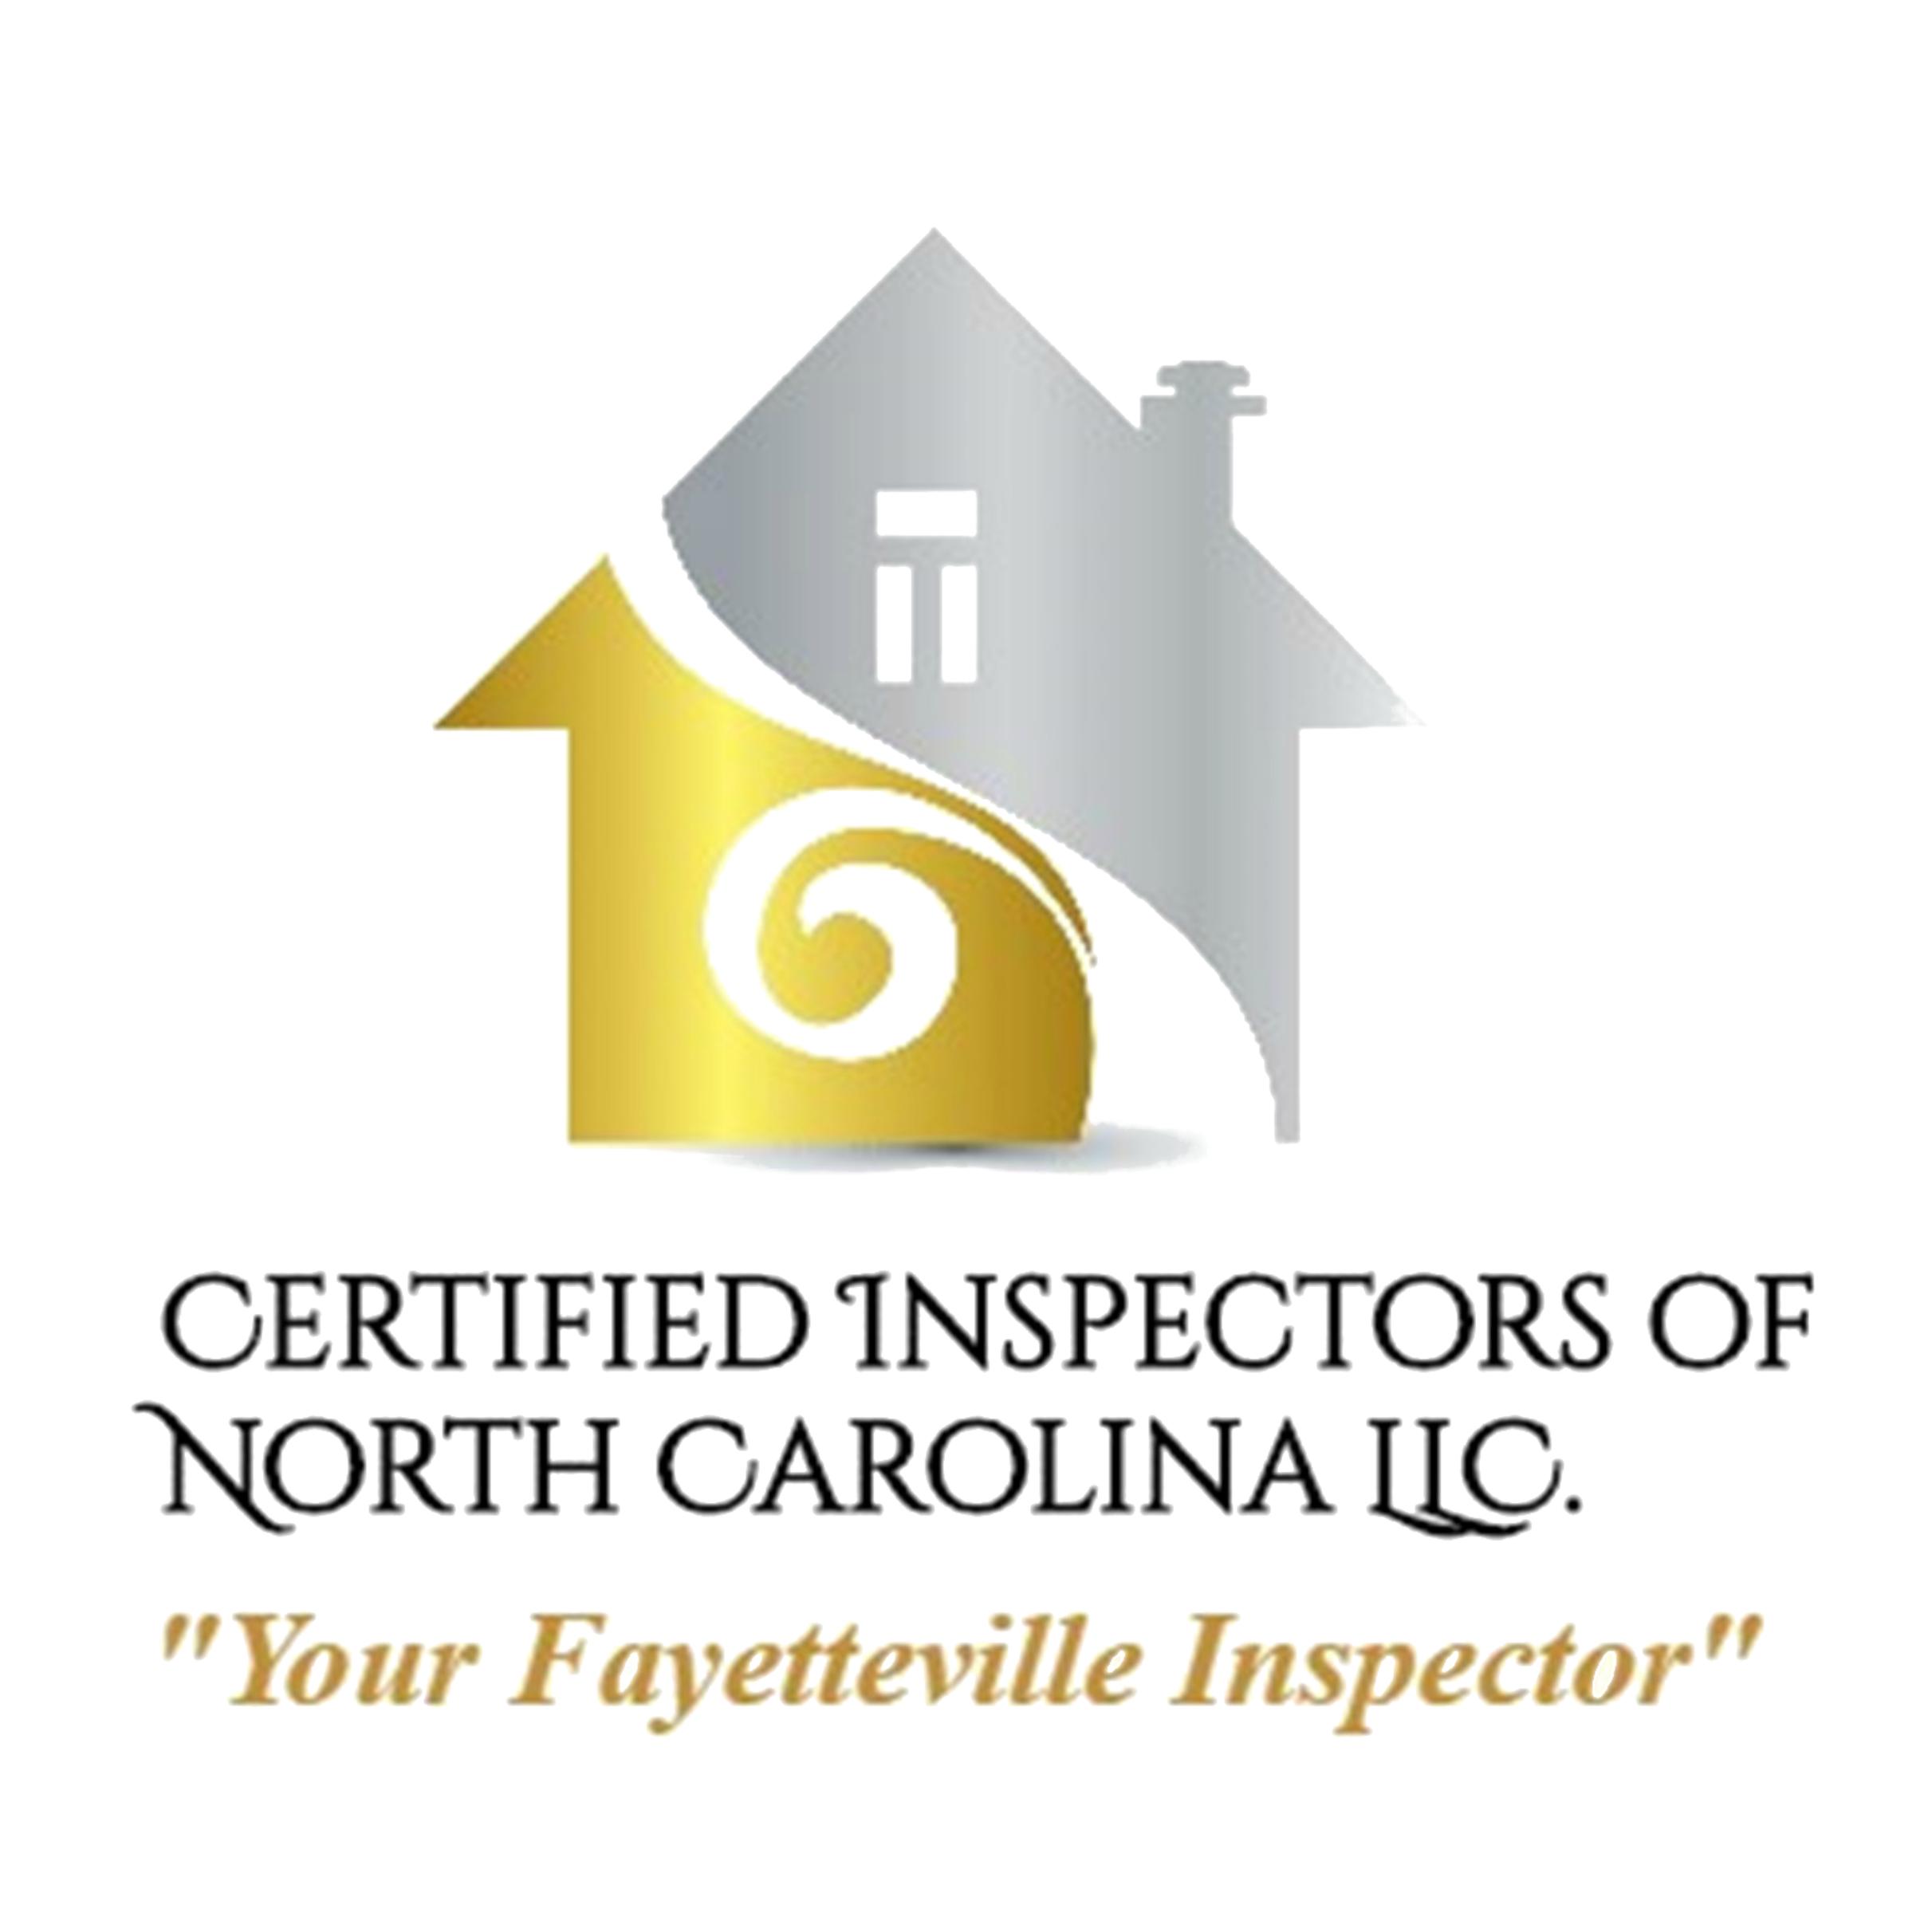 Certified Inspectors of North Carolina LLC - Raeford, NC 28376 - (910)578-4943 | ShowMeLocal.com